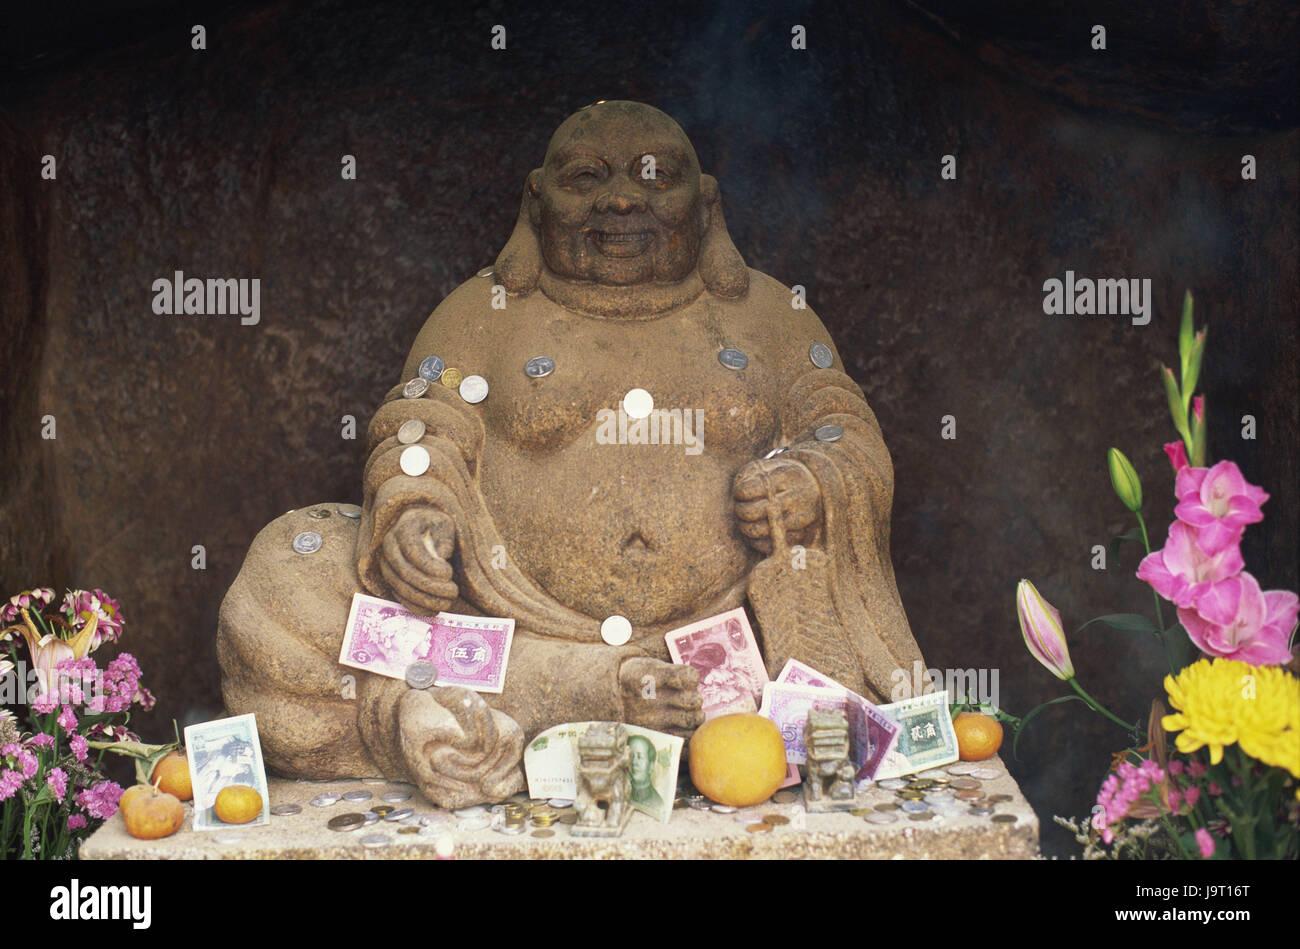 China,Macau,A mA Temple,Buddha,offering money,Asia,Eastern Asia,peninsula,town,faith,religion,Buddhism,statue,Buddha's - Stock Image